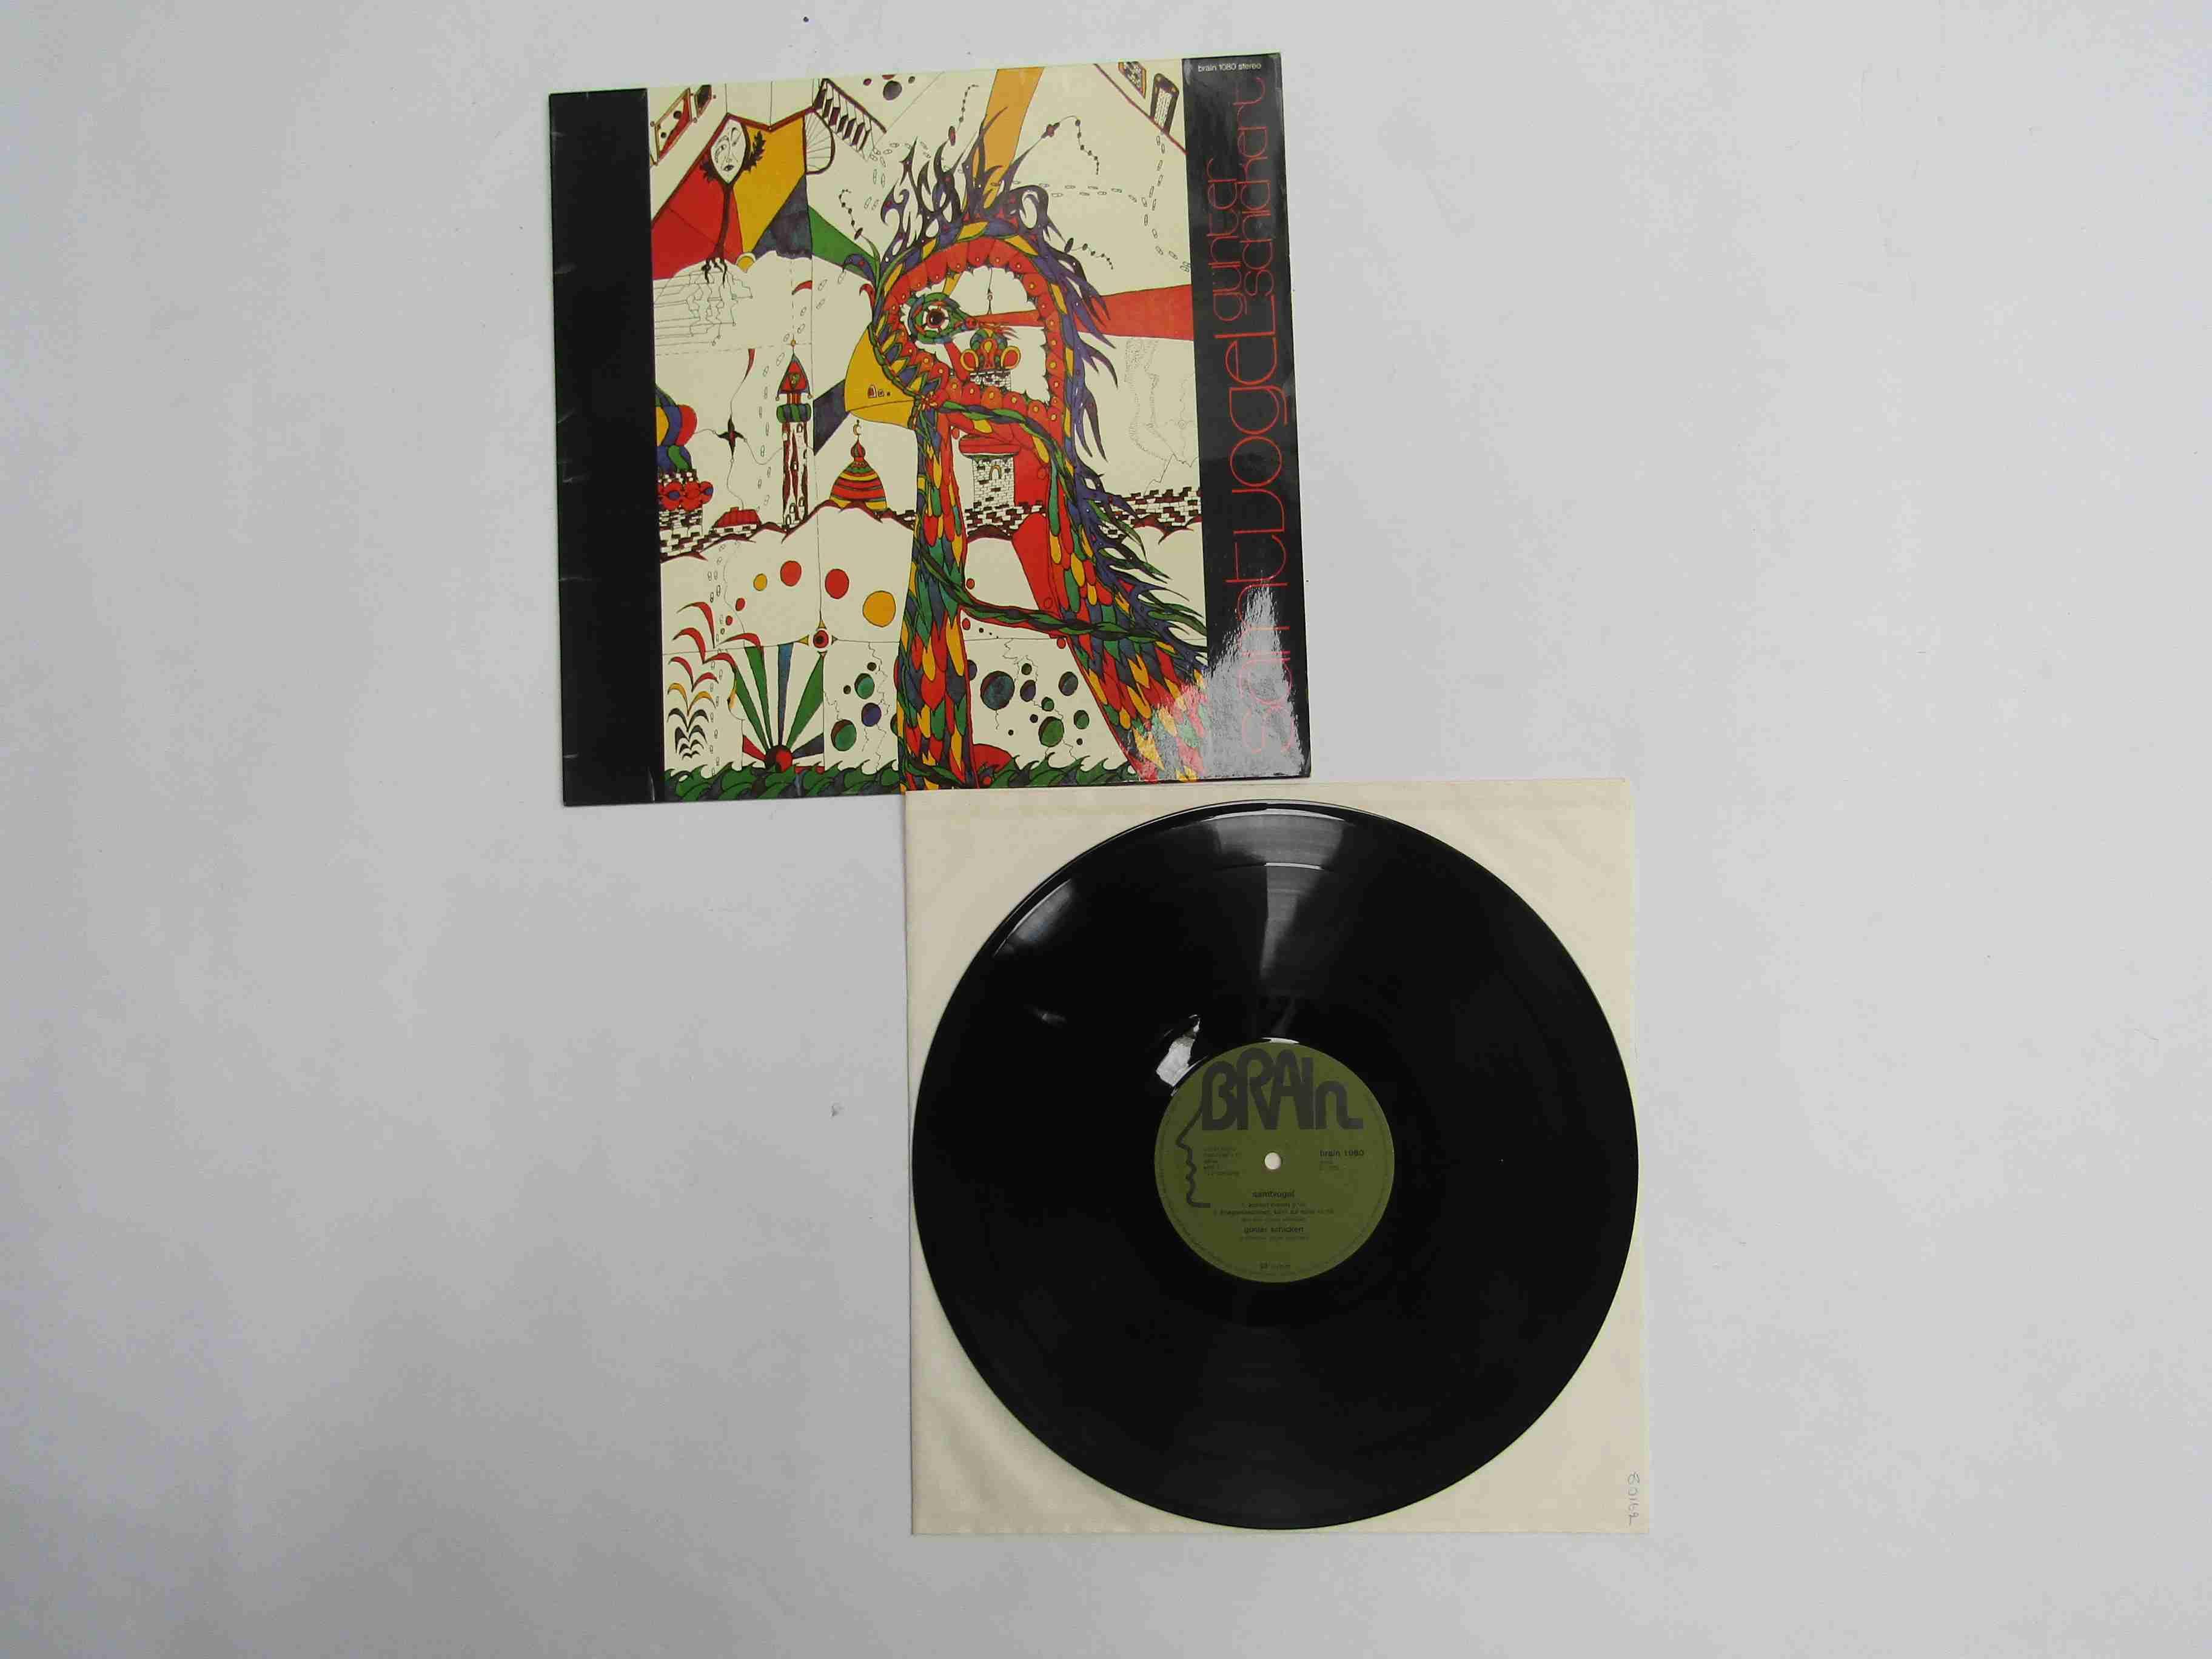 GUNTER SCHICKERT: 'Samtvogel' LP, 1976 German reissue on Brain Records brain 1080 (media VG+/EX,